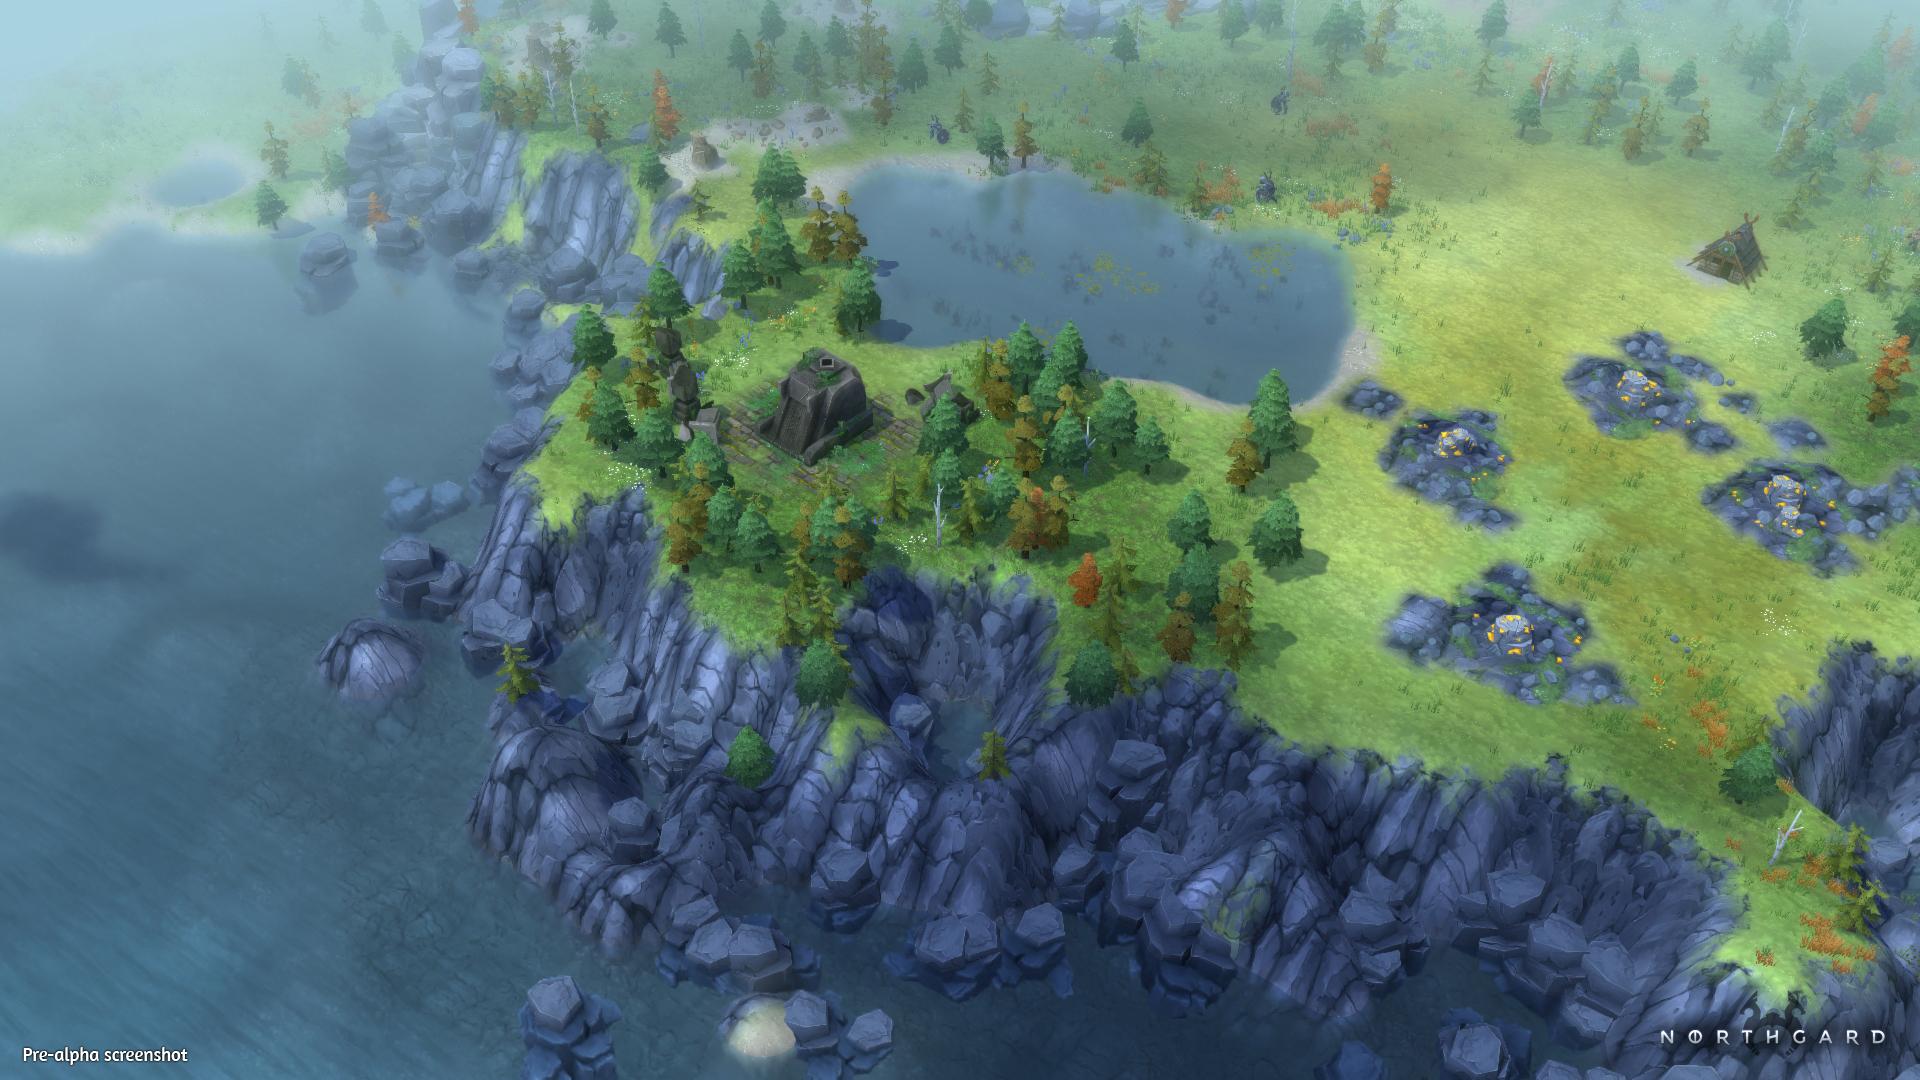 Northgard Review - GodisaGeek com